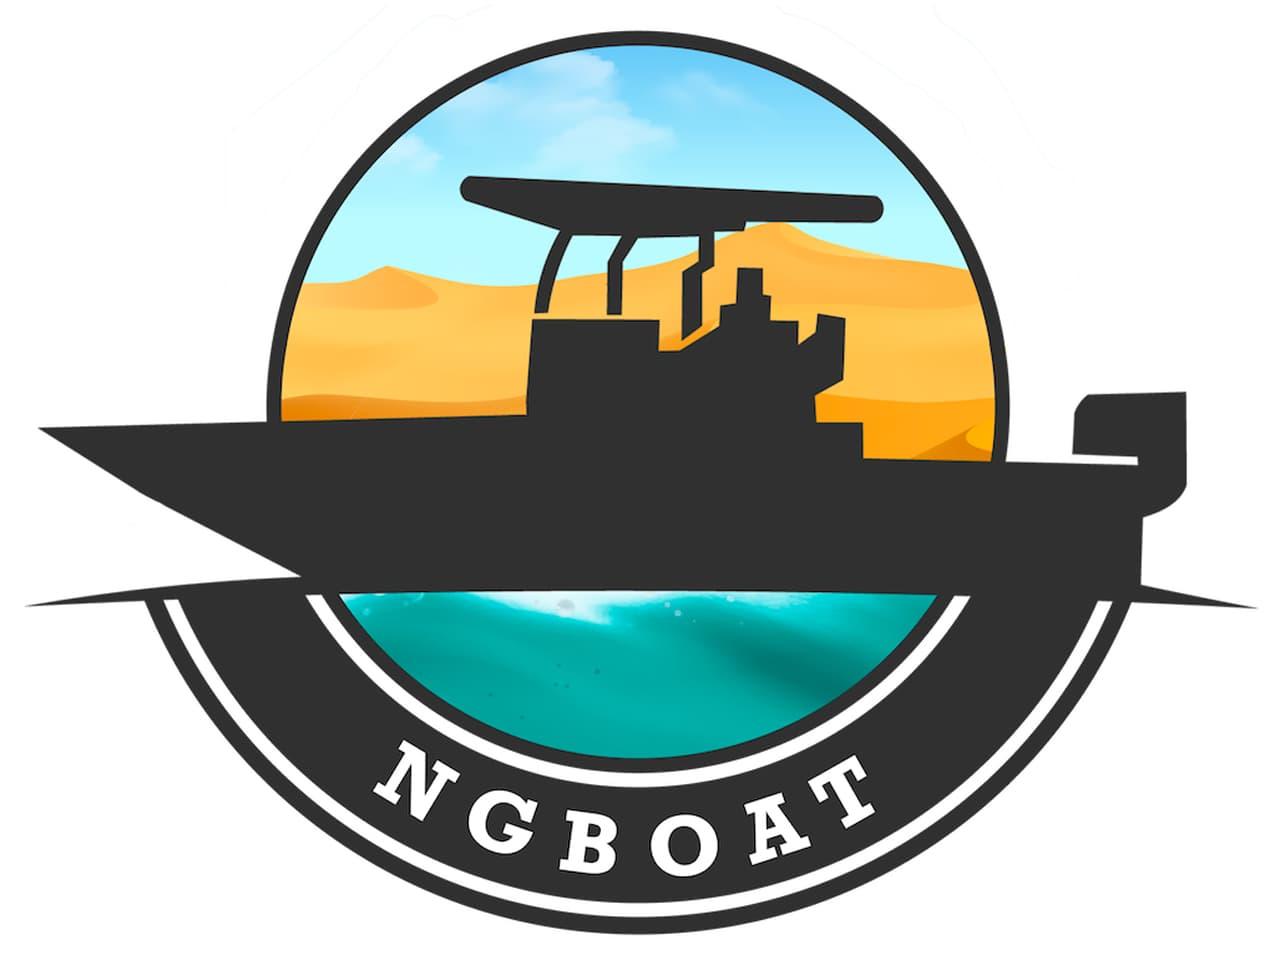 Logo NG Boat au Cap Ferret